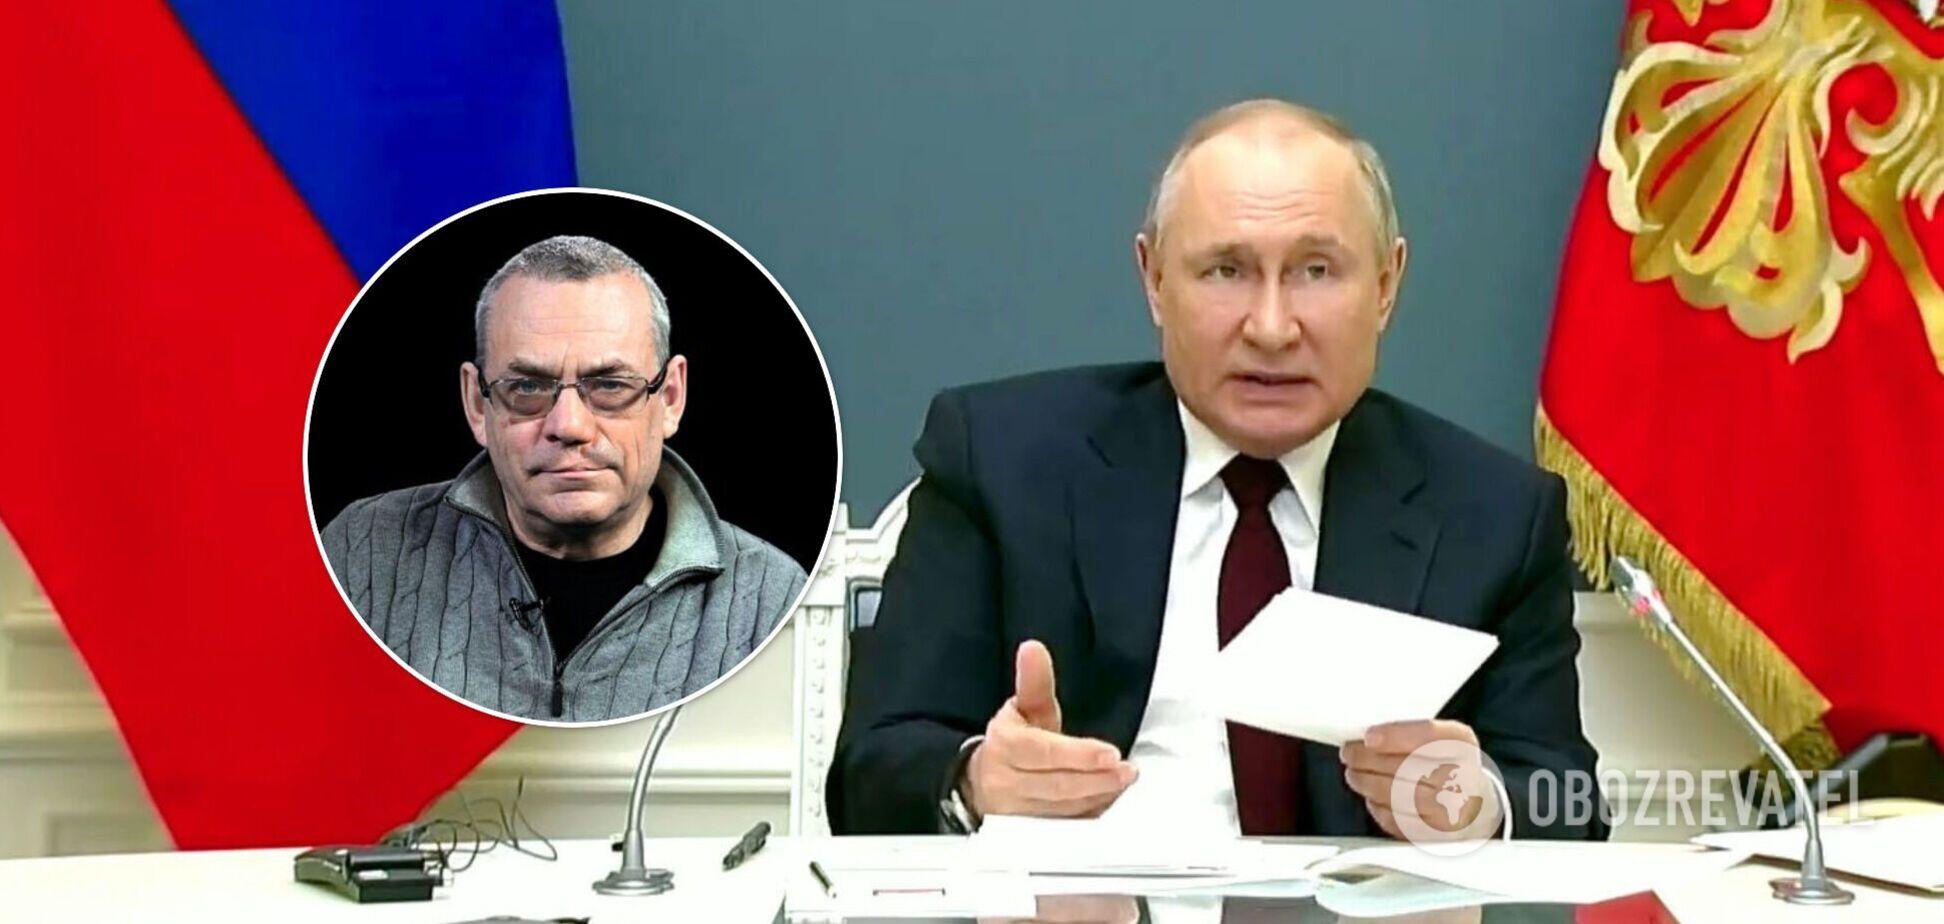 У Путина и Зеленского нет точки компромисса, – Яковенко